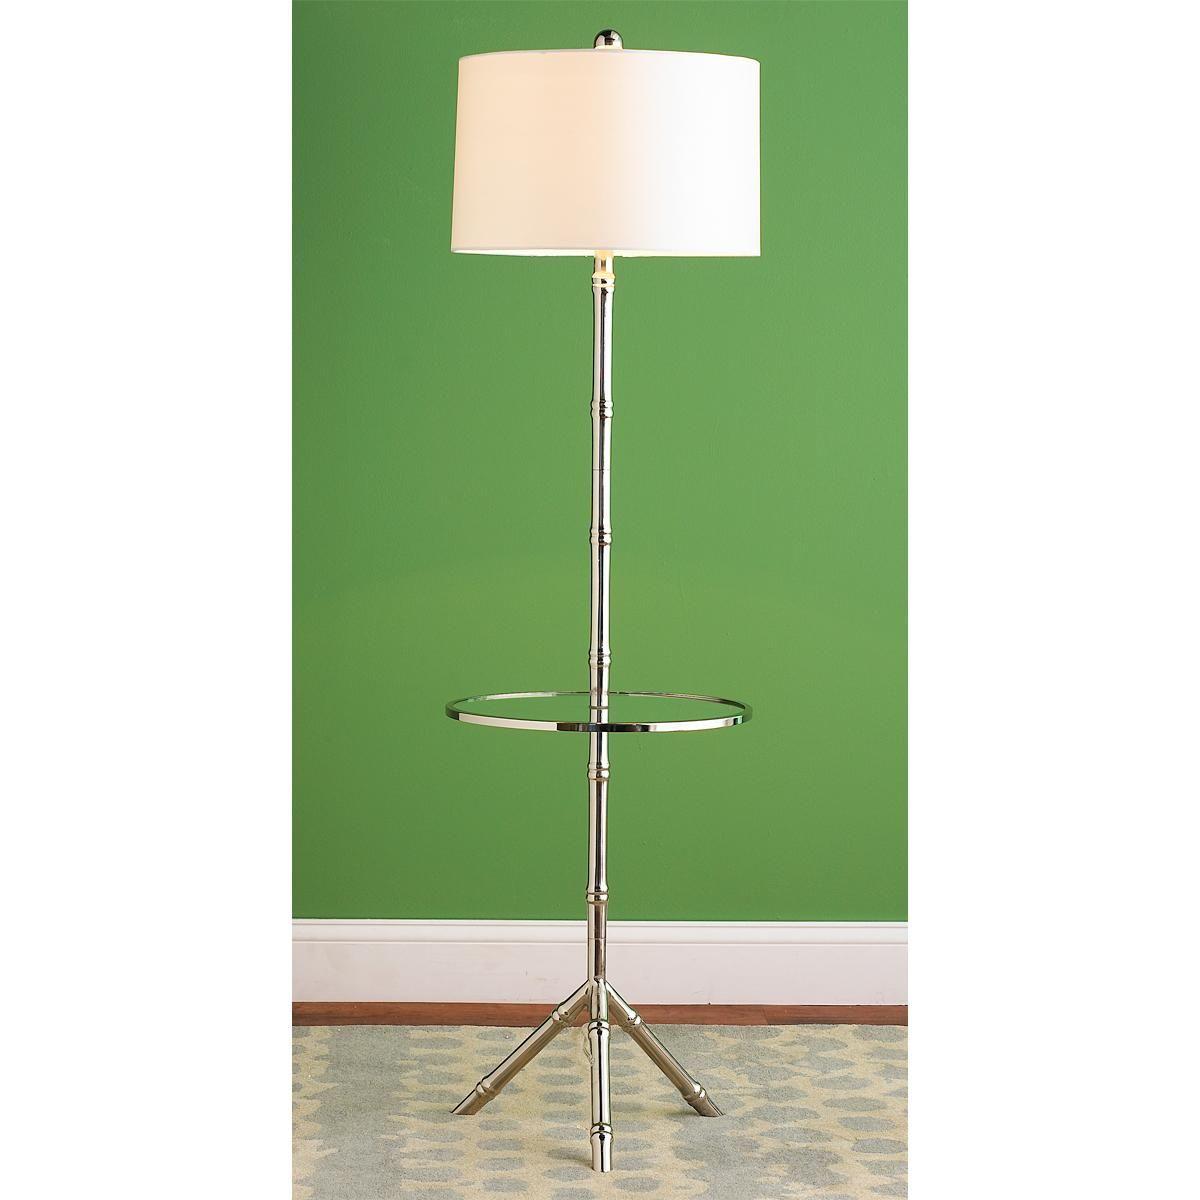 Bamboo tray table floor lamp floor lamp trays and room lamp bamboo tray table floor lamp mozeypictures Choice Image